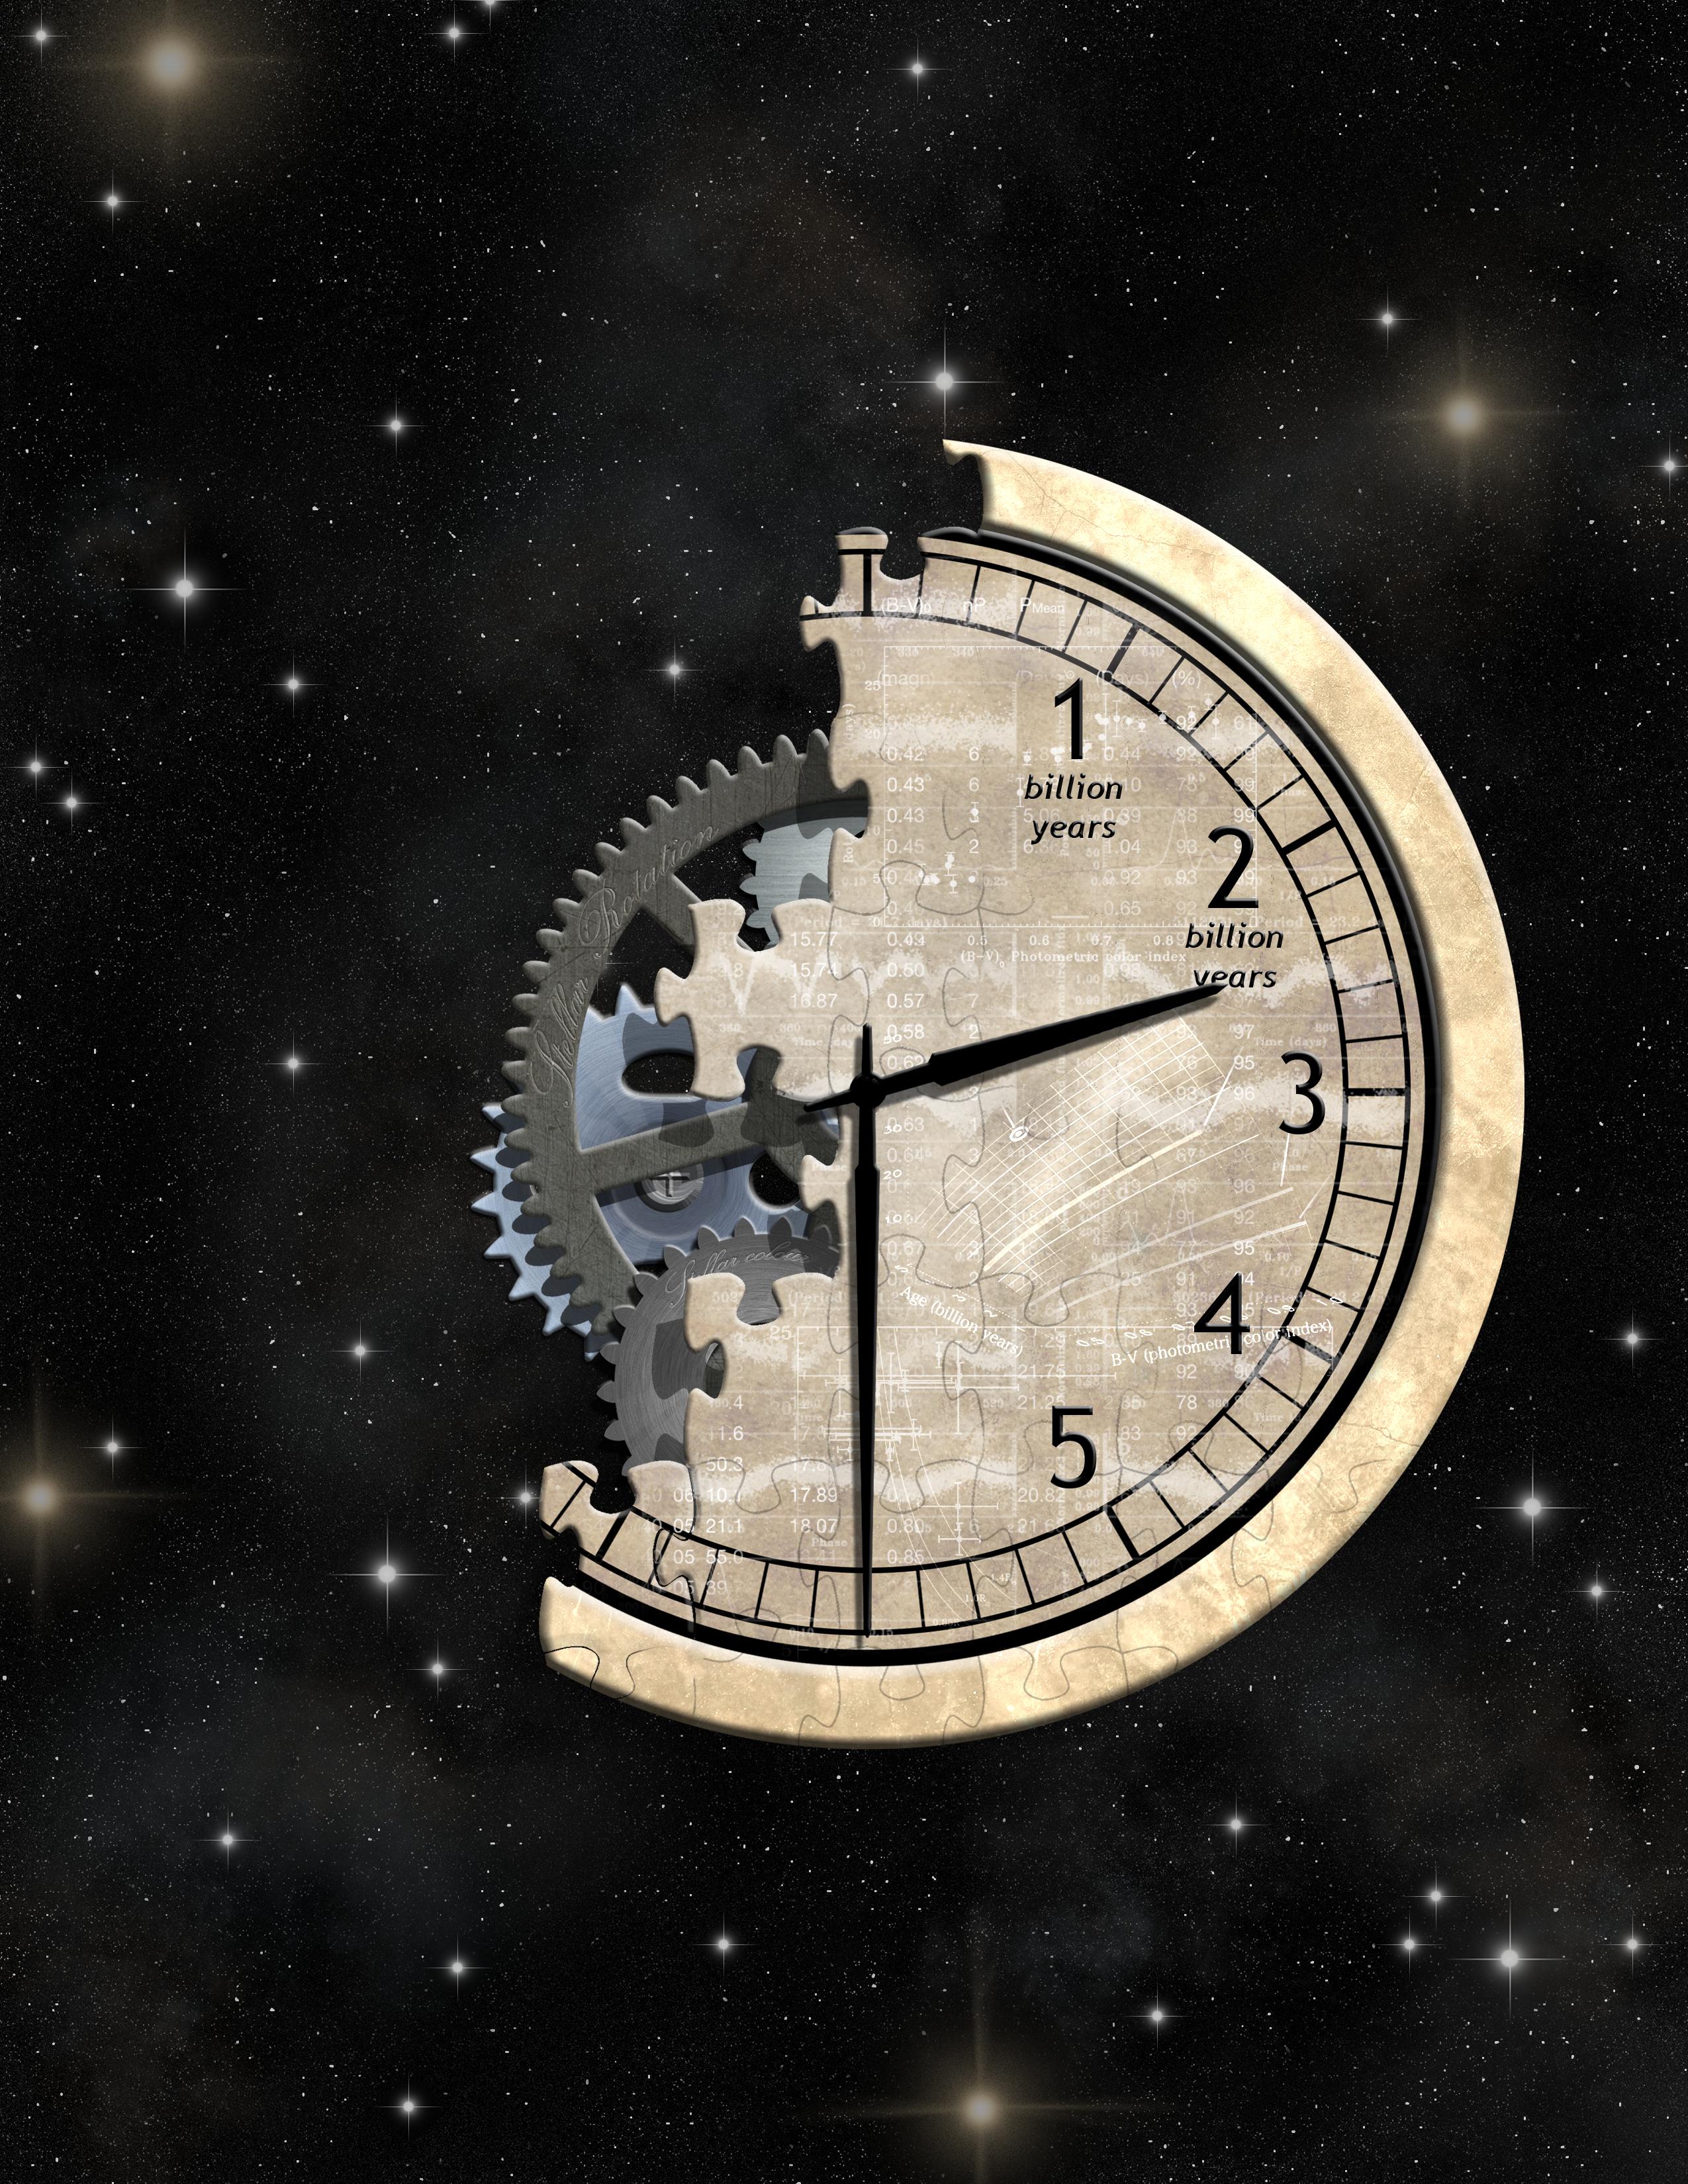 Artist's Impression of Cosmic Clock